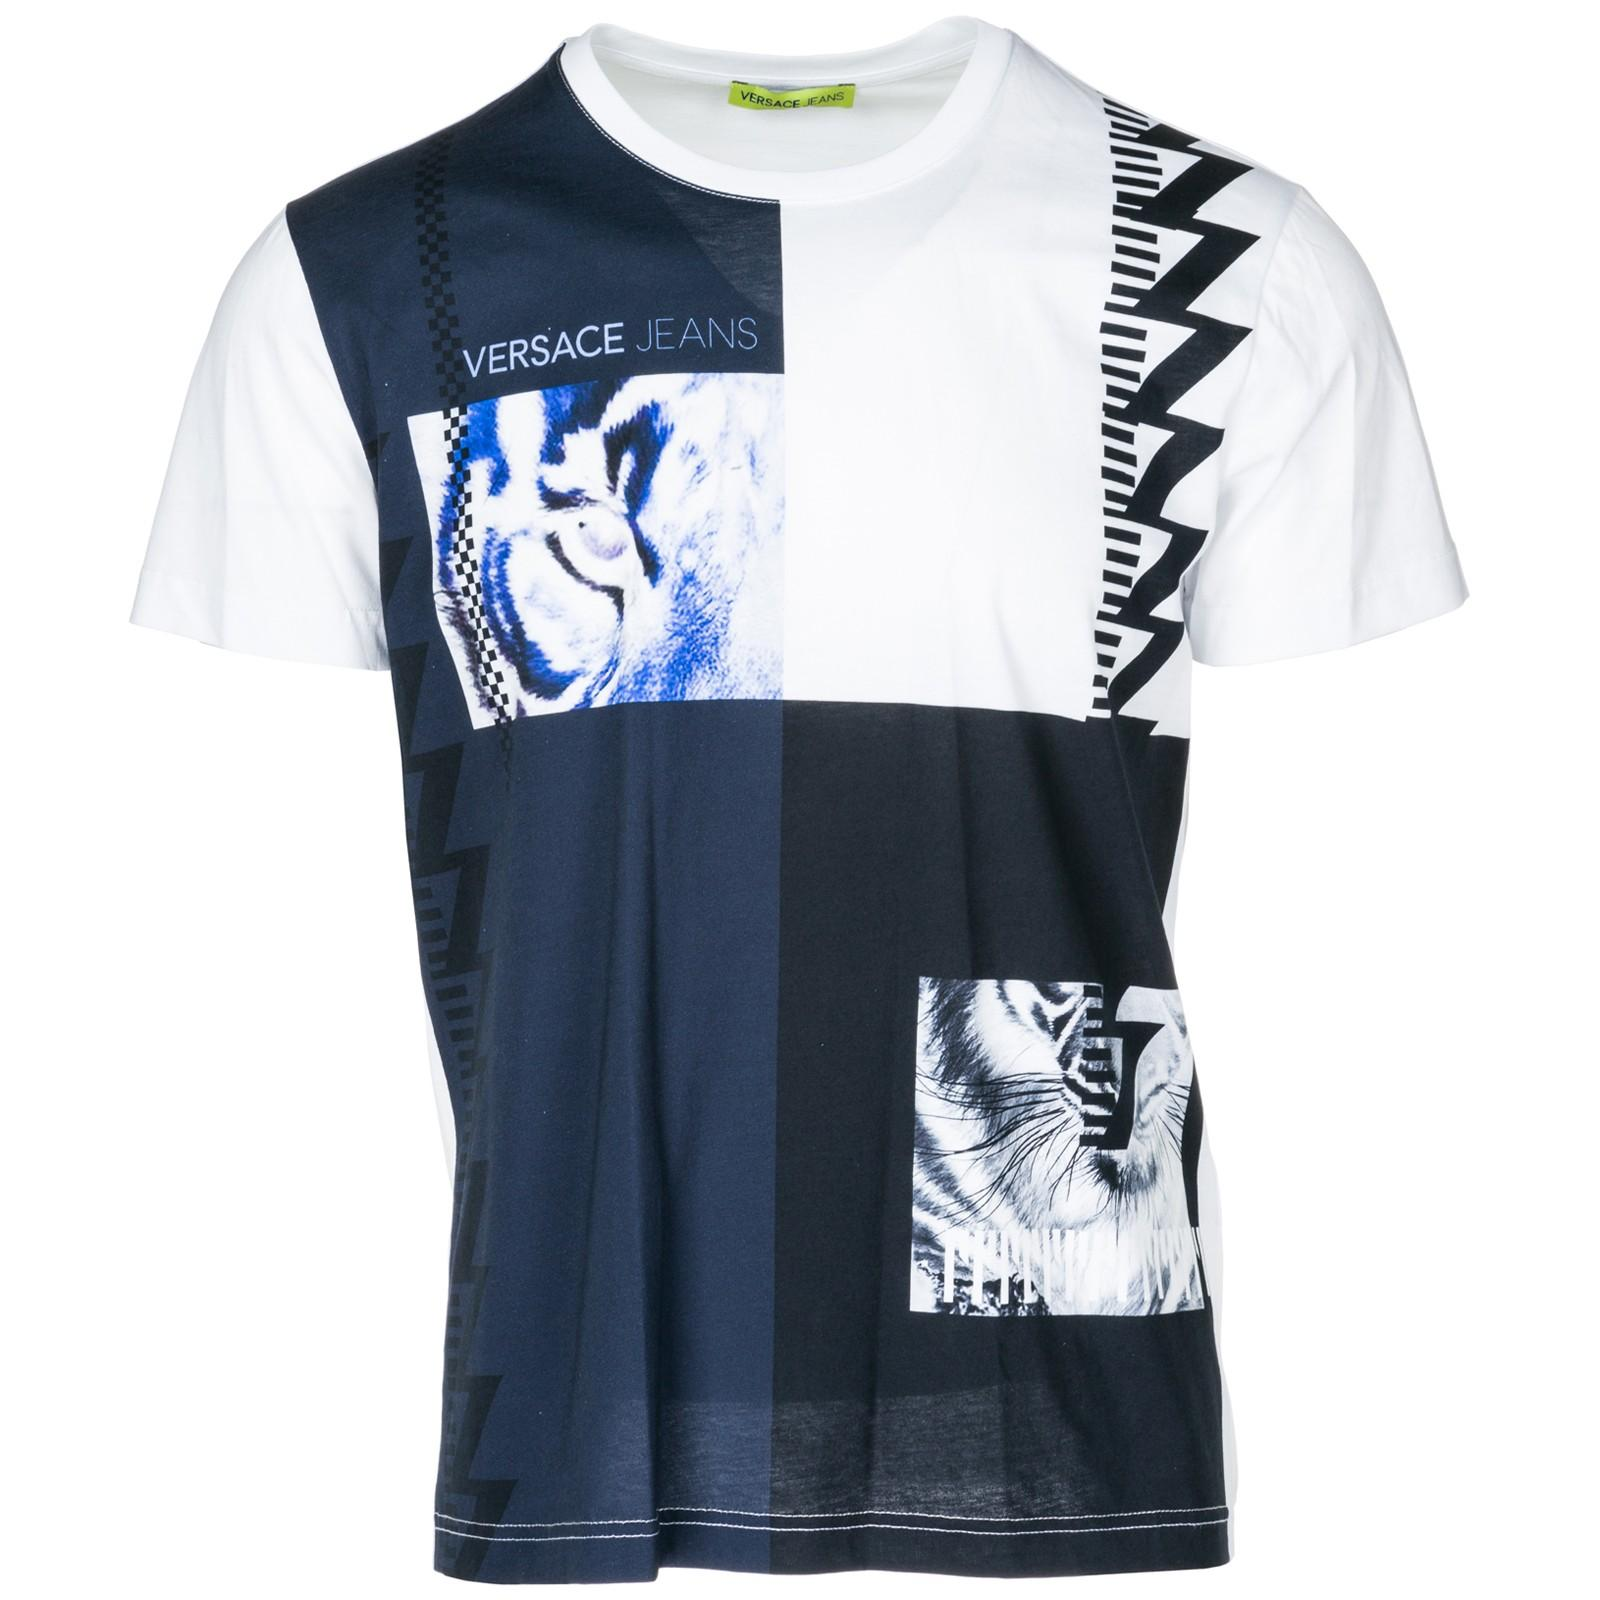 7ed22ca0 Versace Jeans Men's Short Sleeve T-Shirt Crew Neckline Jumper In White